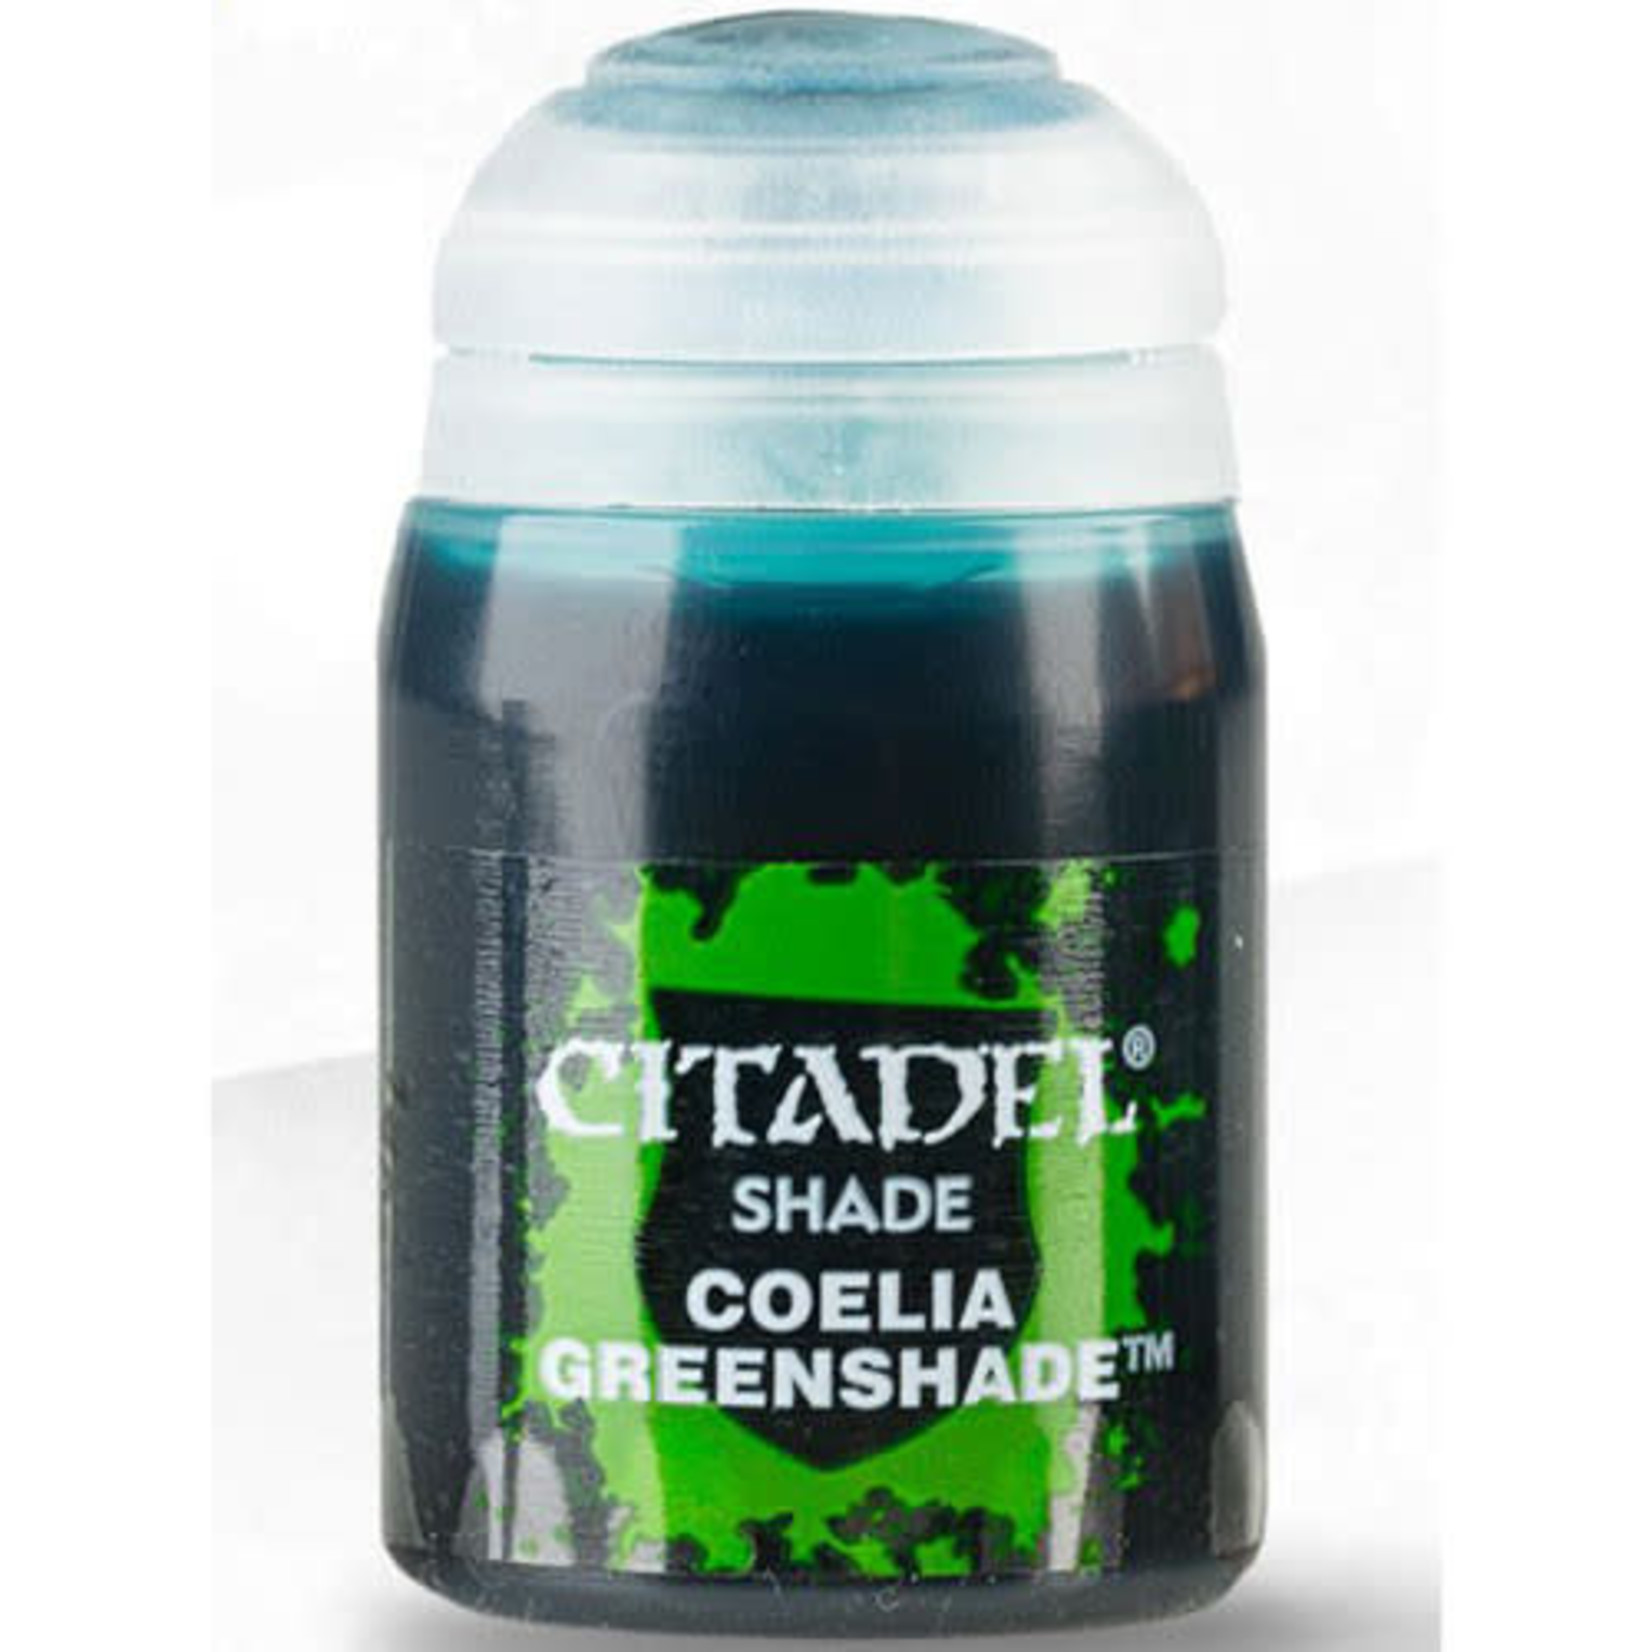 Citadel Citadel Paint - Shade: Coelia Greenshade